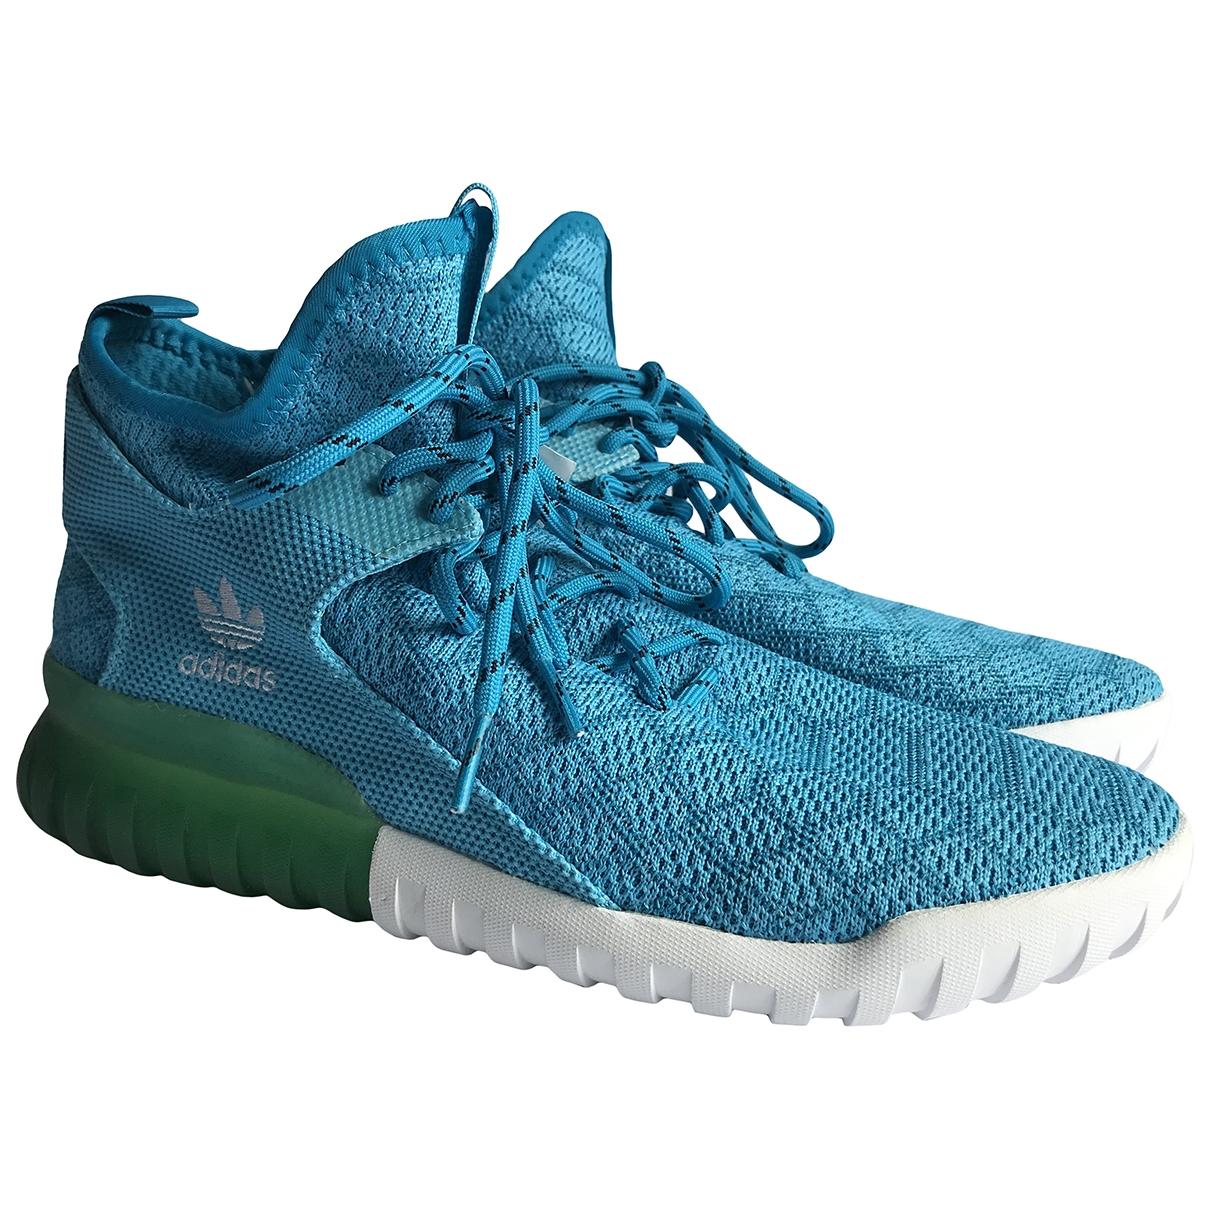 Adidas - Baskets Tubular pour homme en toile - bleu